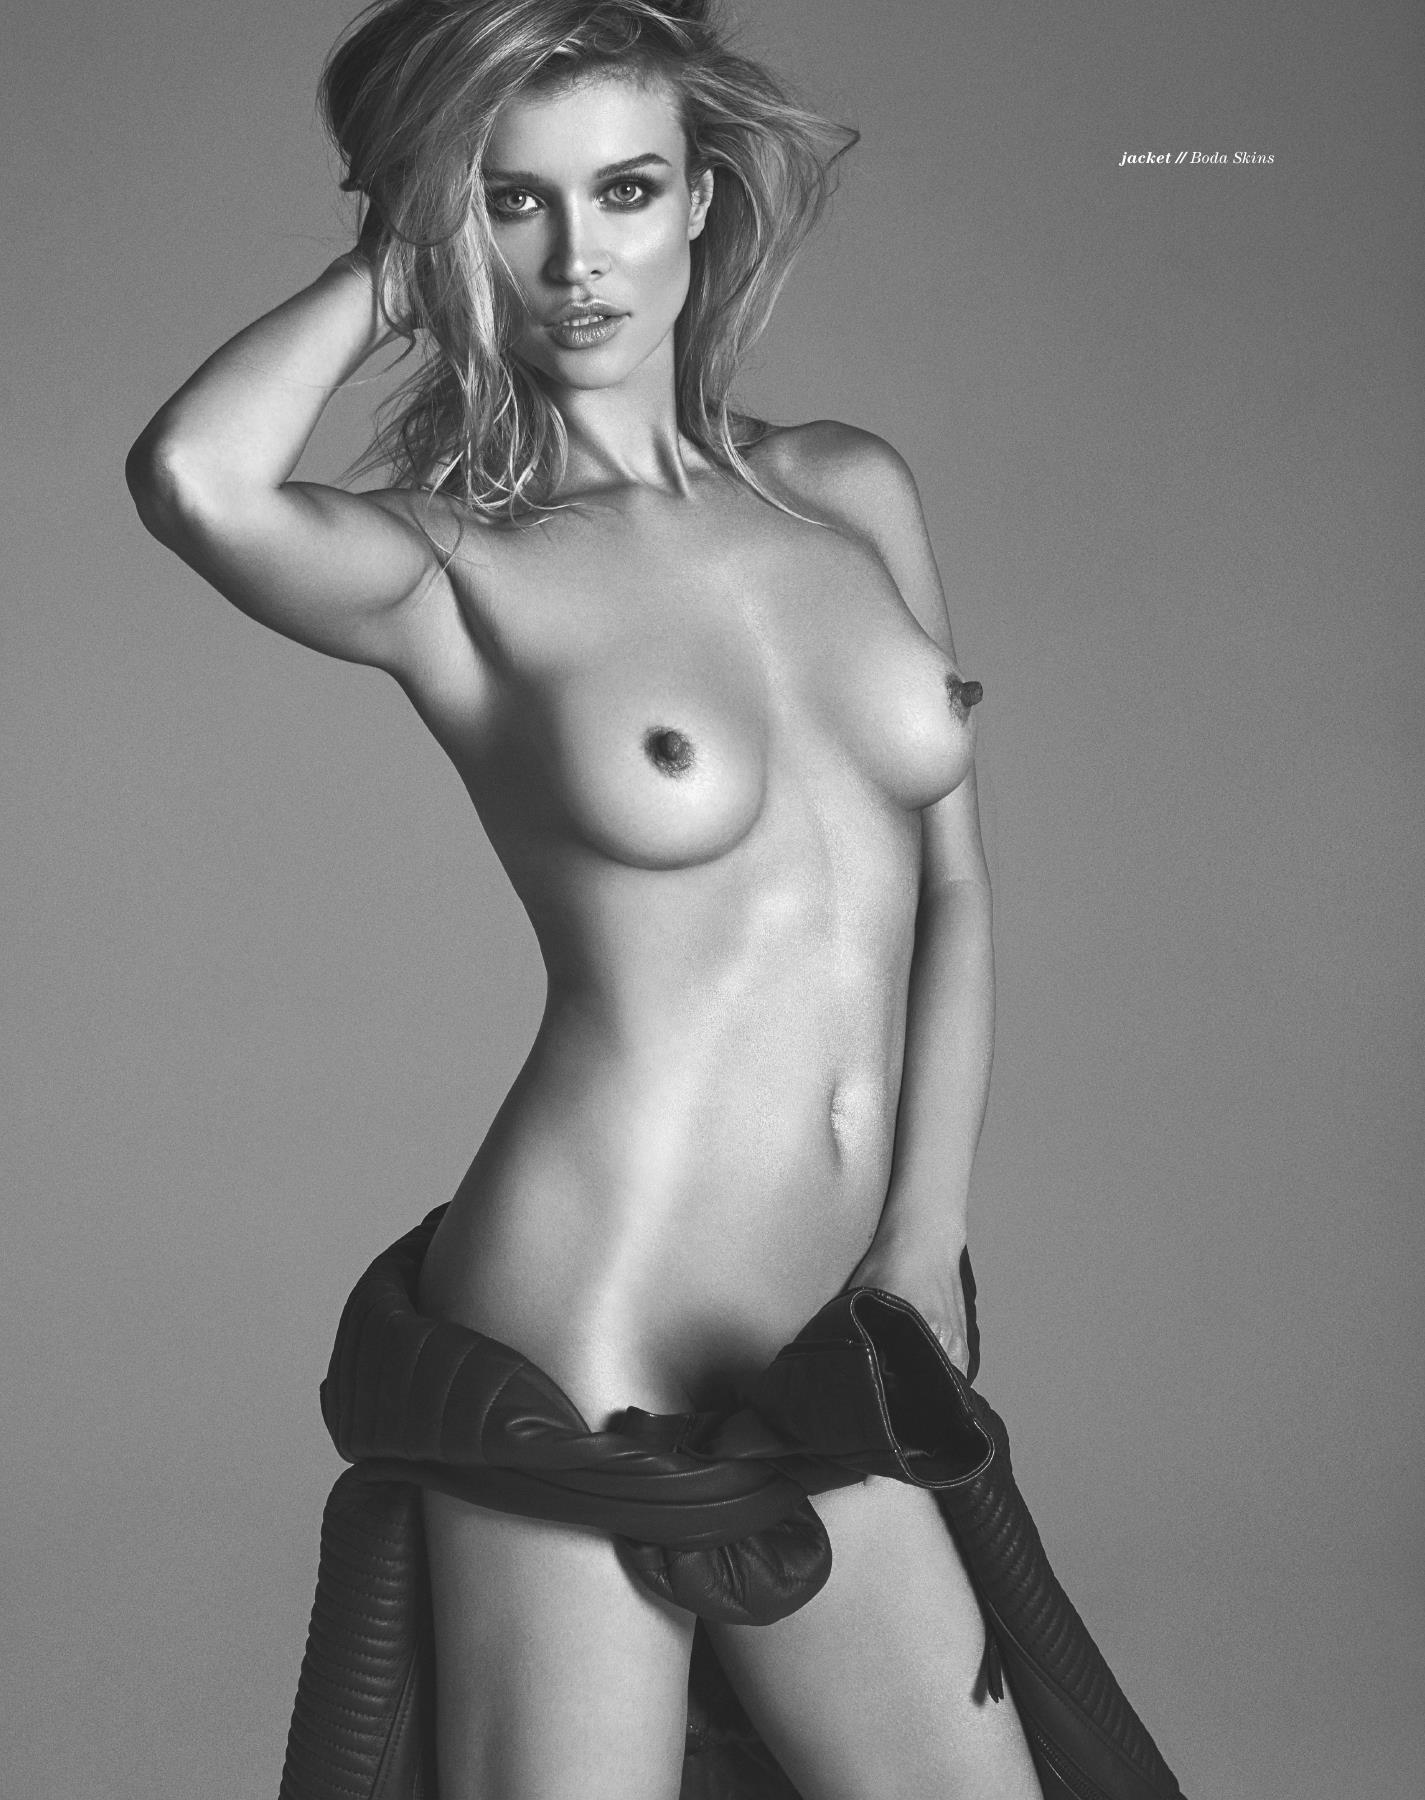 Joanna fox naked think, that